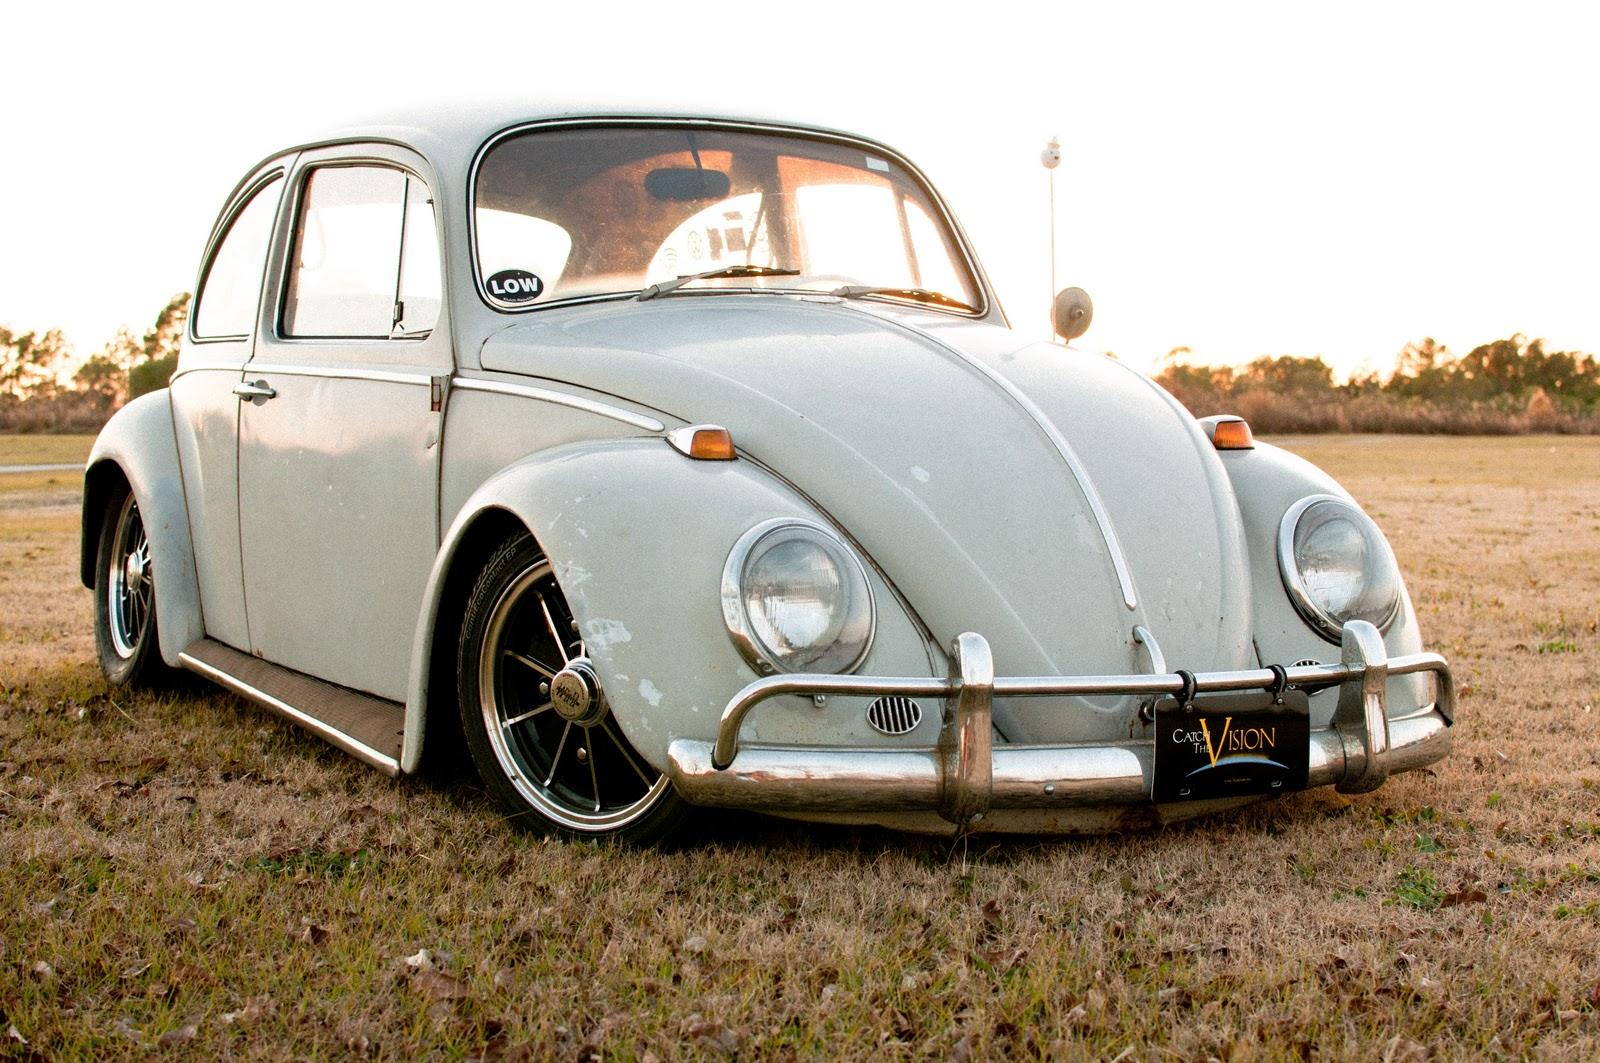 Otis - my '65 Beetle DSC_0022